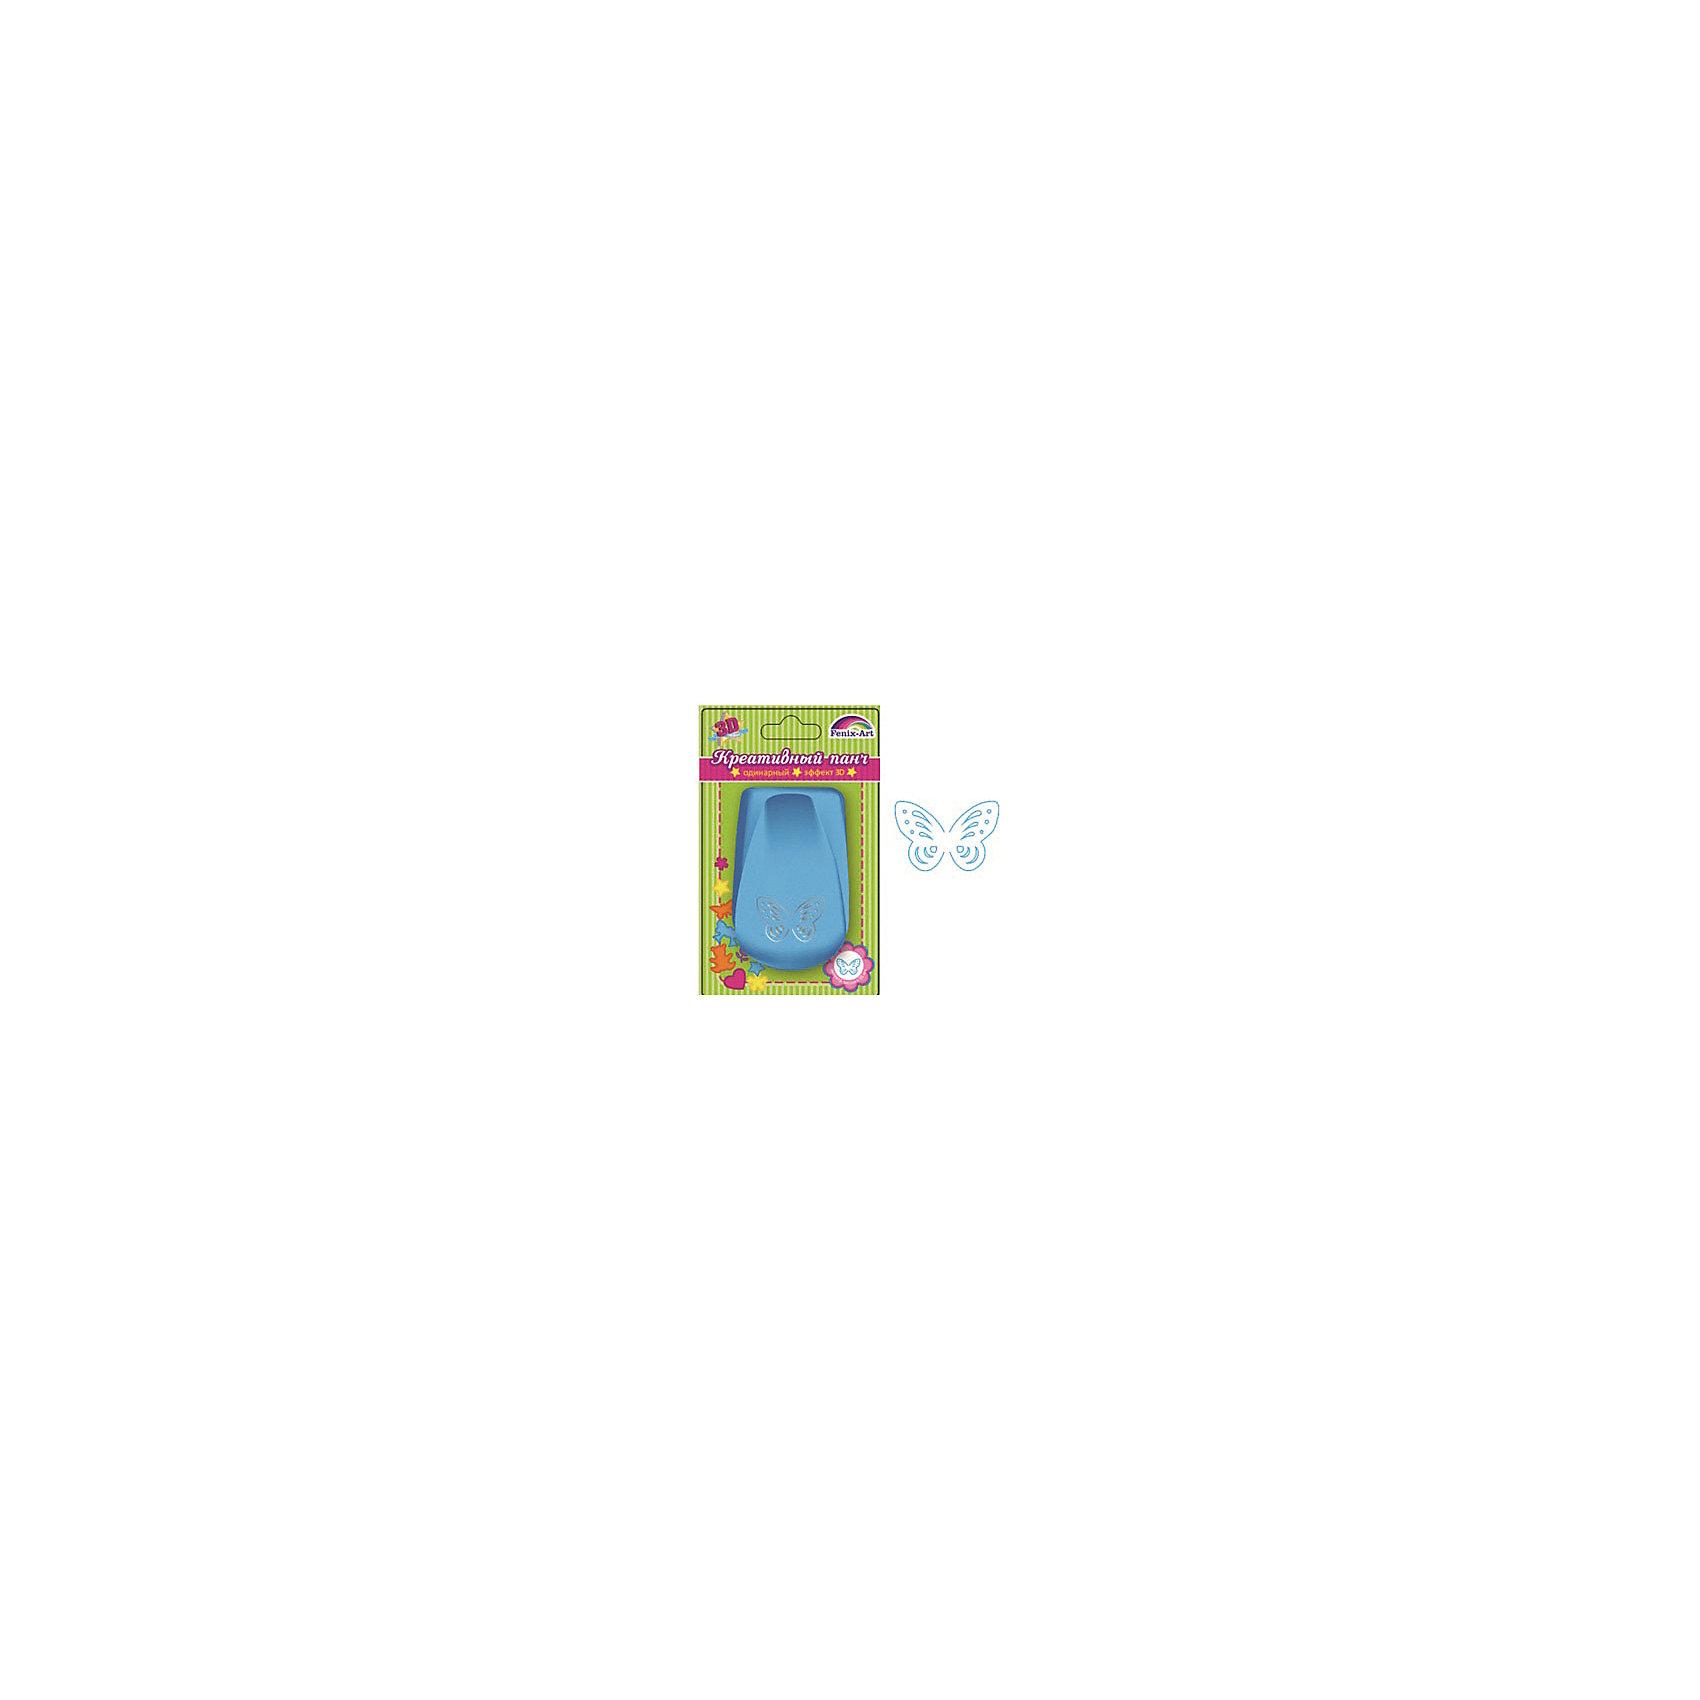 Панч-дырокол одинарный 55мм Бабочка Феникс+Бумага<br>Панч-дырокол одинарный БАБОЧКА/55 (размер рисунка 55мм, размер панча 116х76х104, эффект 3D, голубой цвет, в блистере)<br><br>Ширина мм: 170<br>Глубина мм: 105<br>Высота мм: 100<br>Вес г: 415<br>Возраст от месяцев: 72<br>Возраст до месяцев: 2147483647<br>Пол: Унисекс<br>Возраст: Детский<br>SKU: 7046287